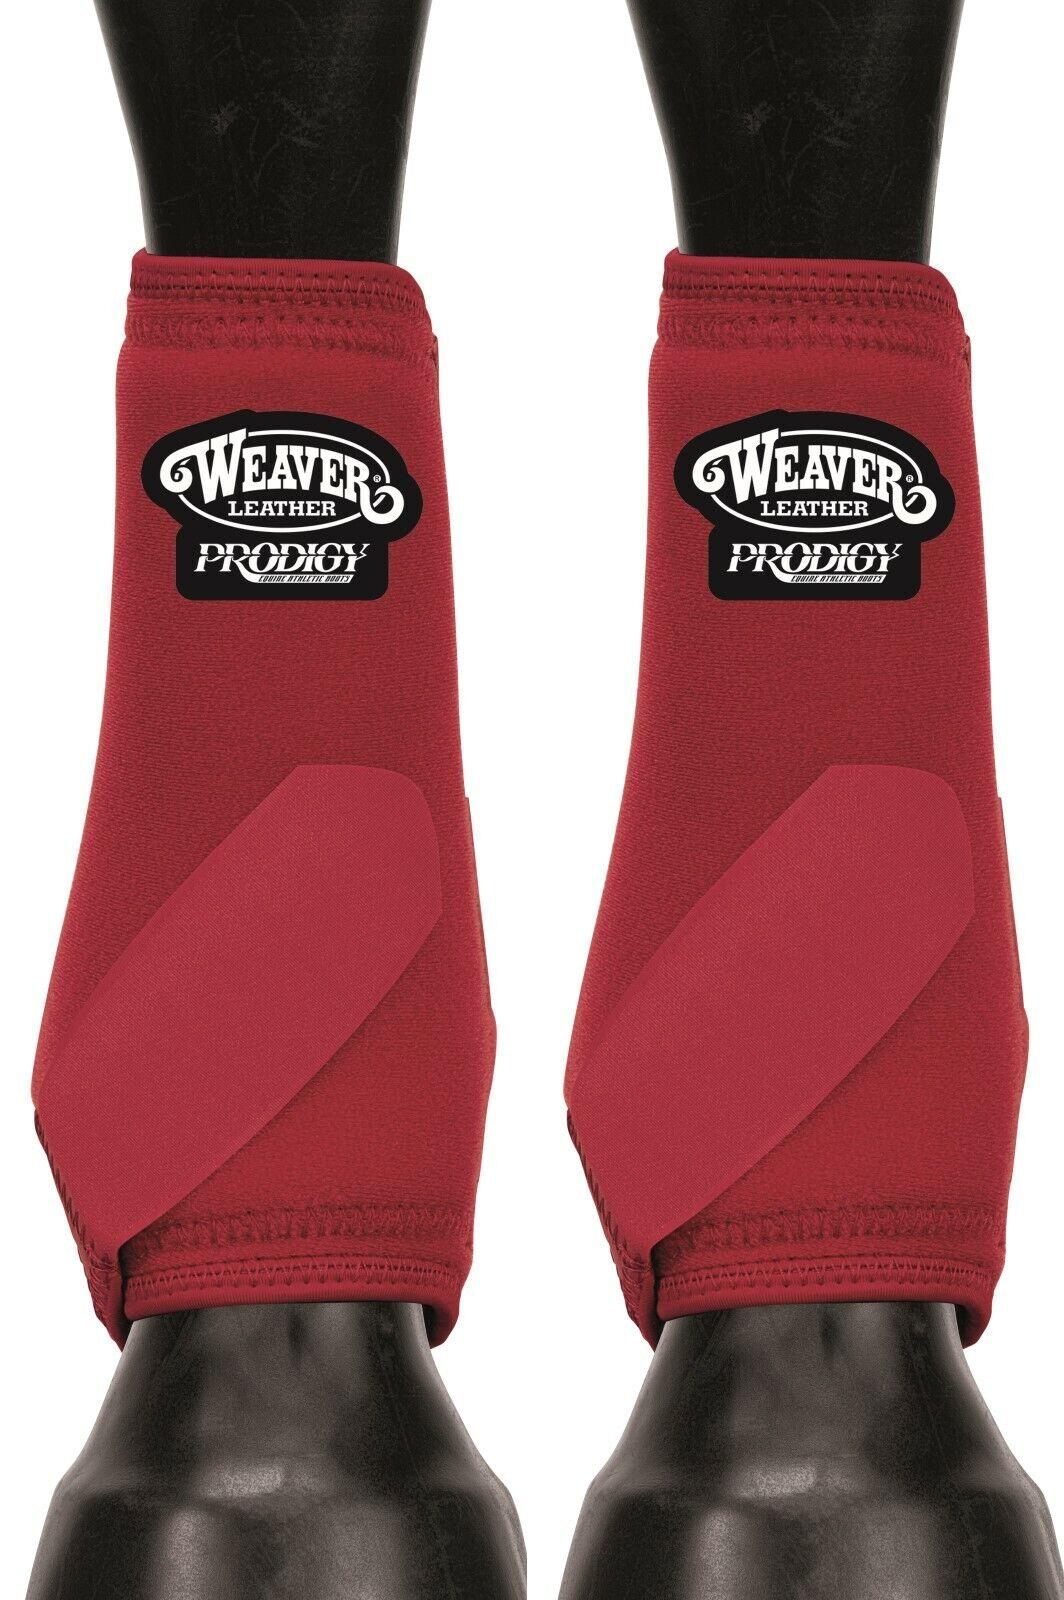 Weaver Leather Equine Original prodigio Performance atlética pequeñas y medianas empresas botas 2 Pack Rojo